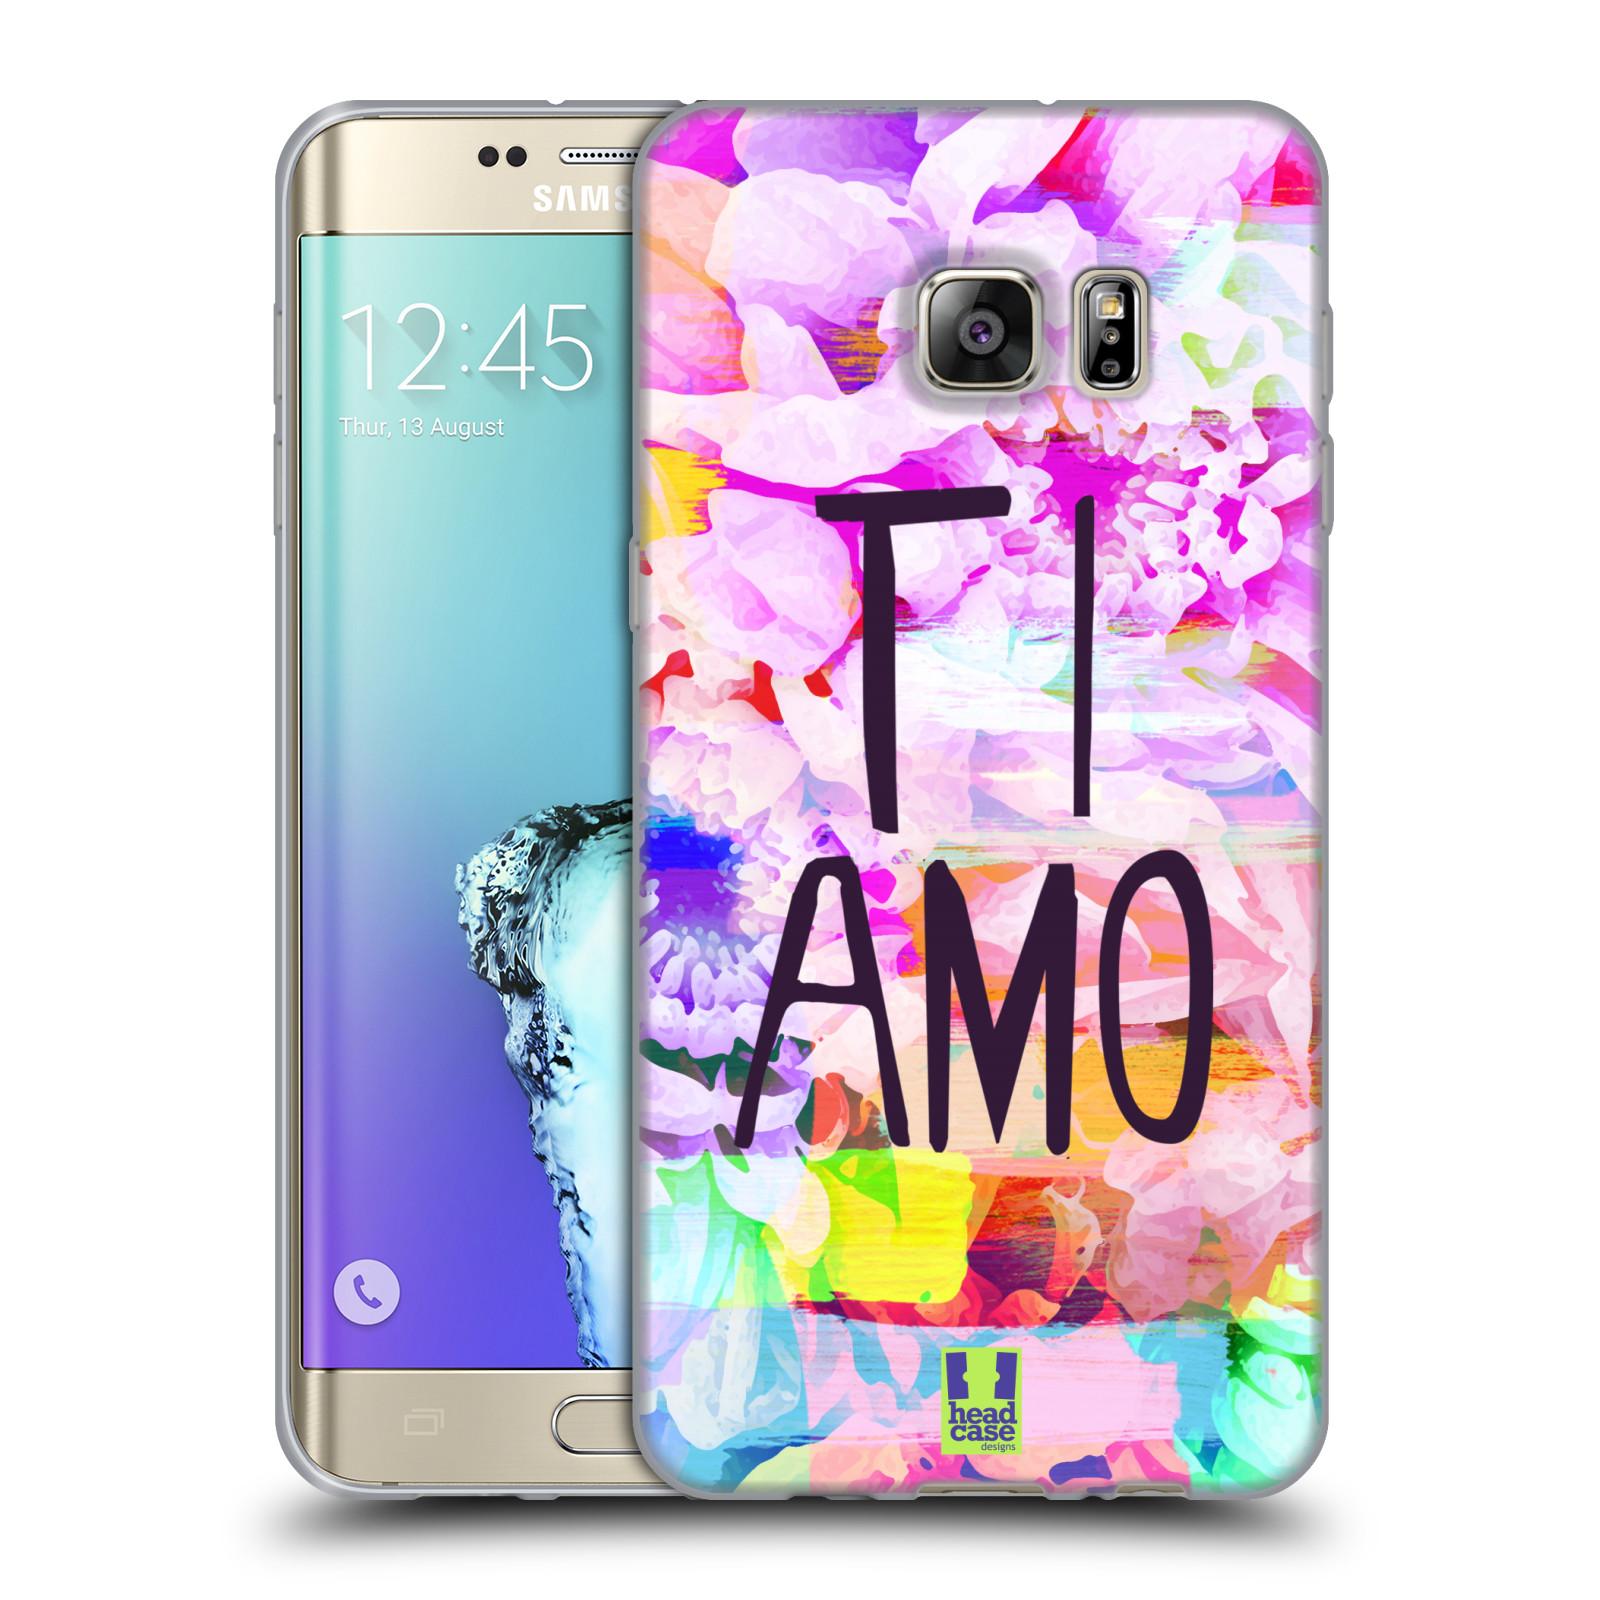 HEAD CASE silikonový obal na mobil Samsung Galaxy S6 EDGE PLUS (G928F)  Láska a květy Ti Amo e138c3ec3c4